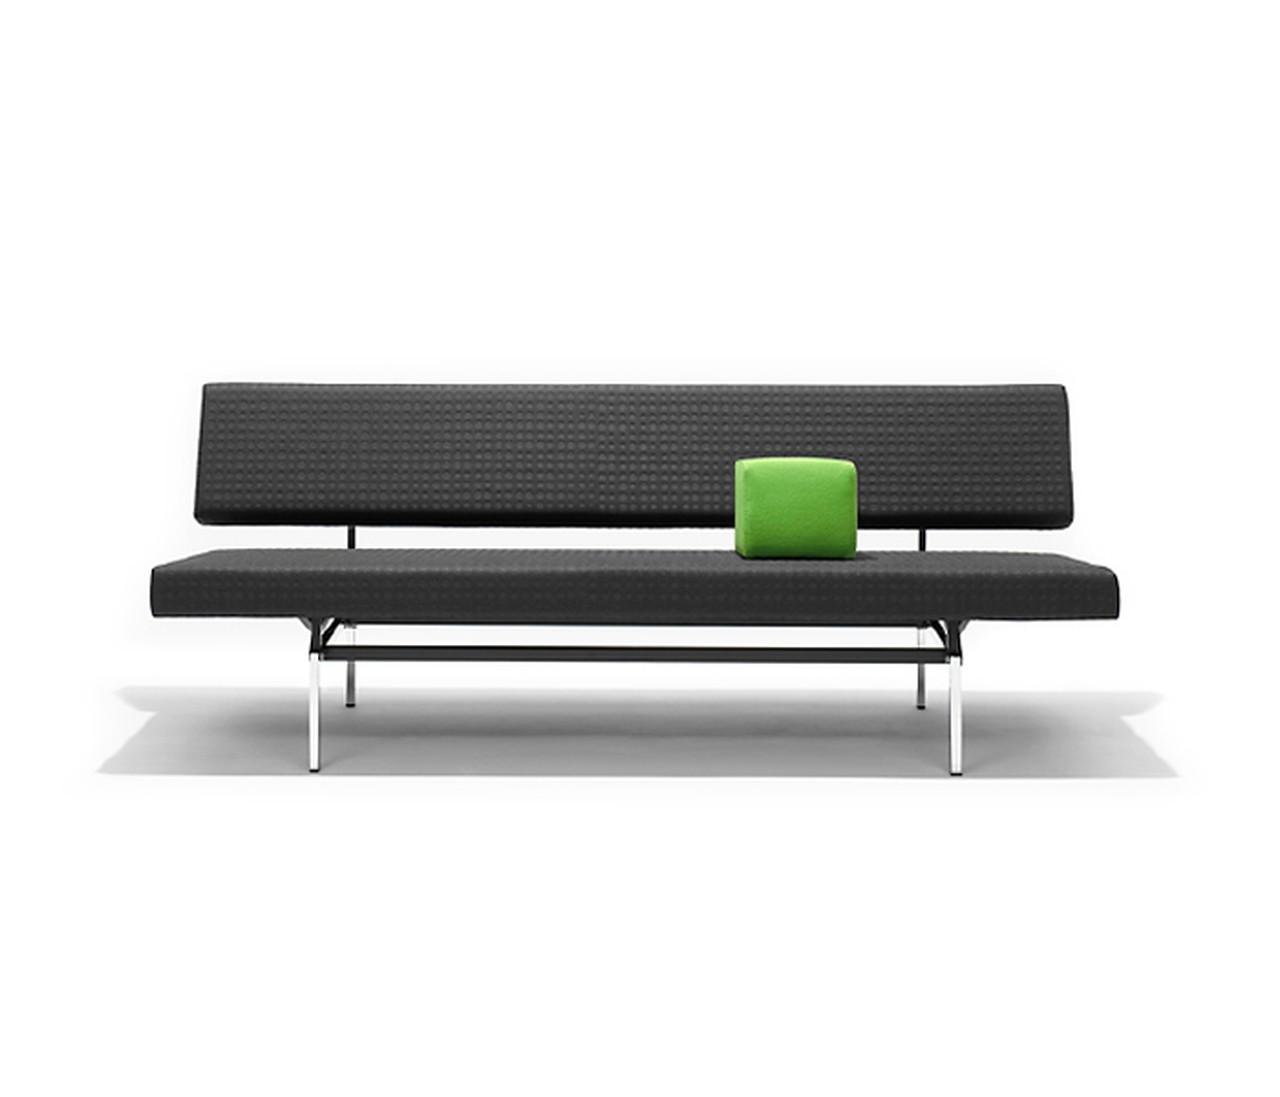 Design Slaapbank Gijs Van Der Sluis 540.Siesta 540 Casala Kmp Kantoormeubilair